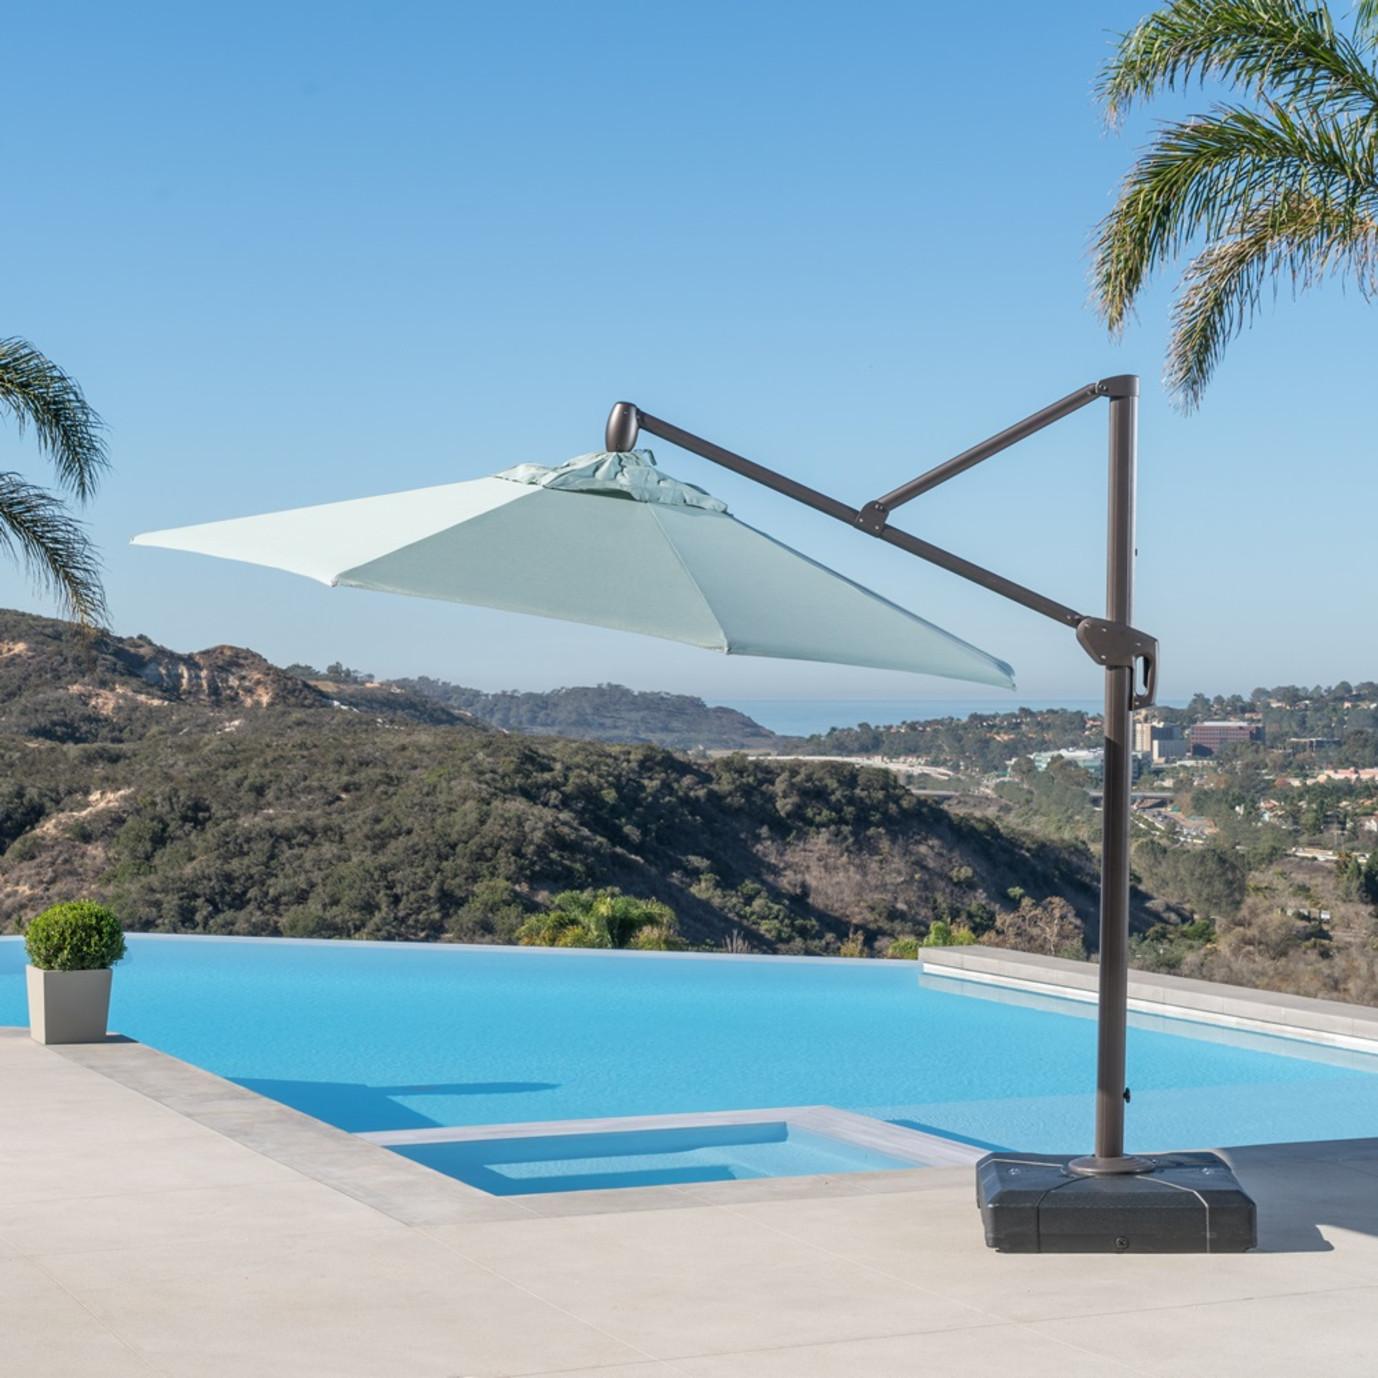 Modular Outdoor 10' Round Umbrella - Bliss Blue